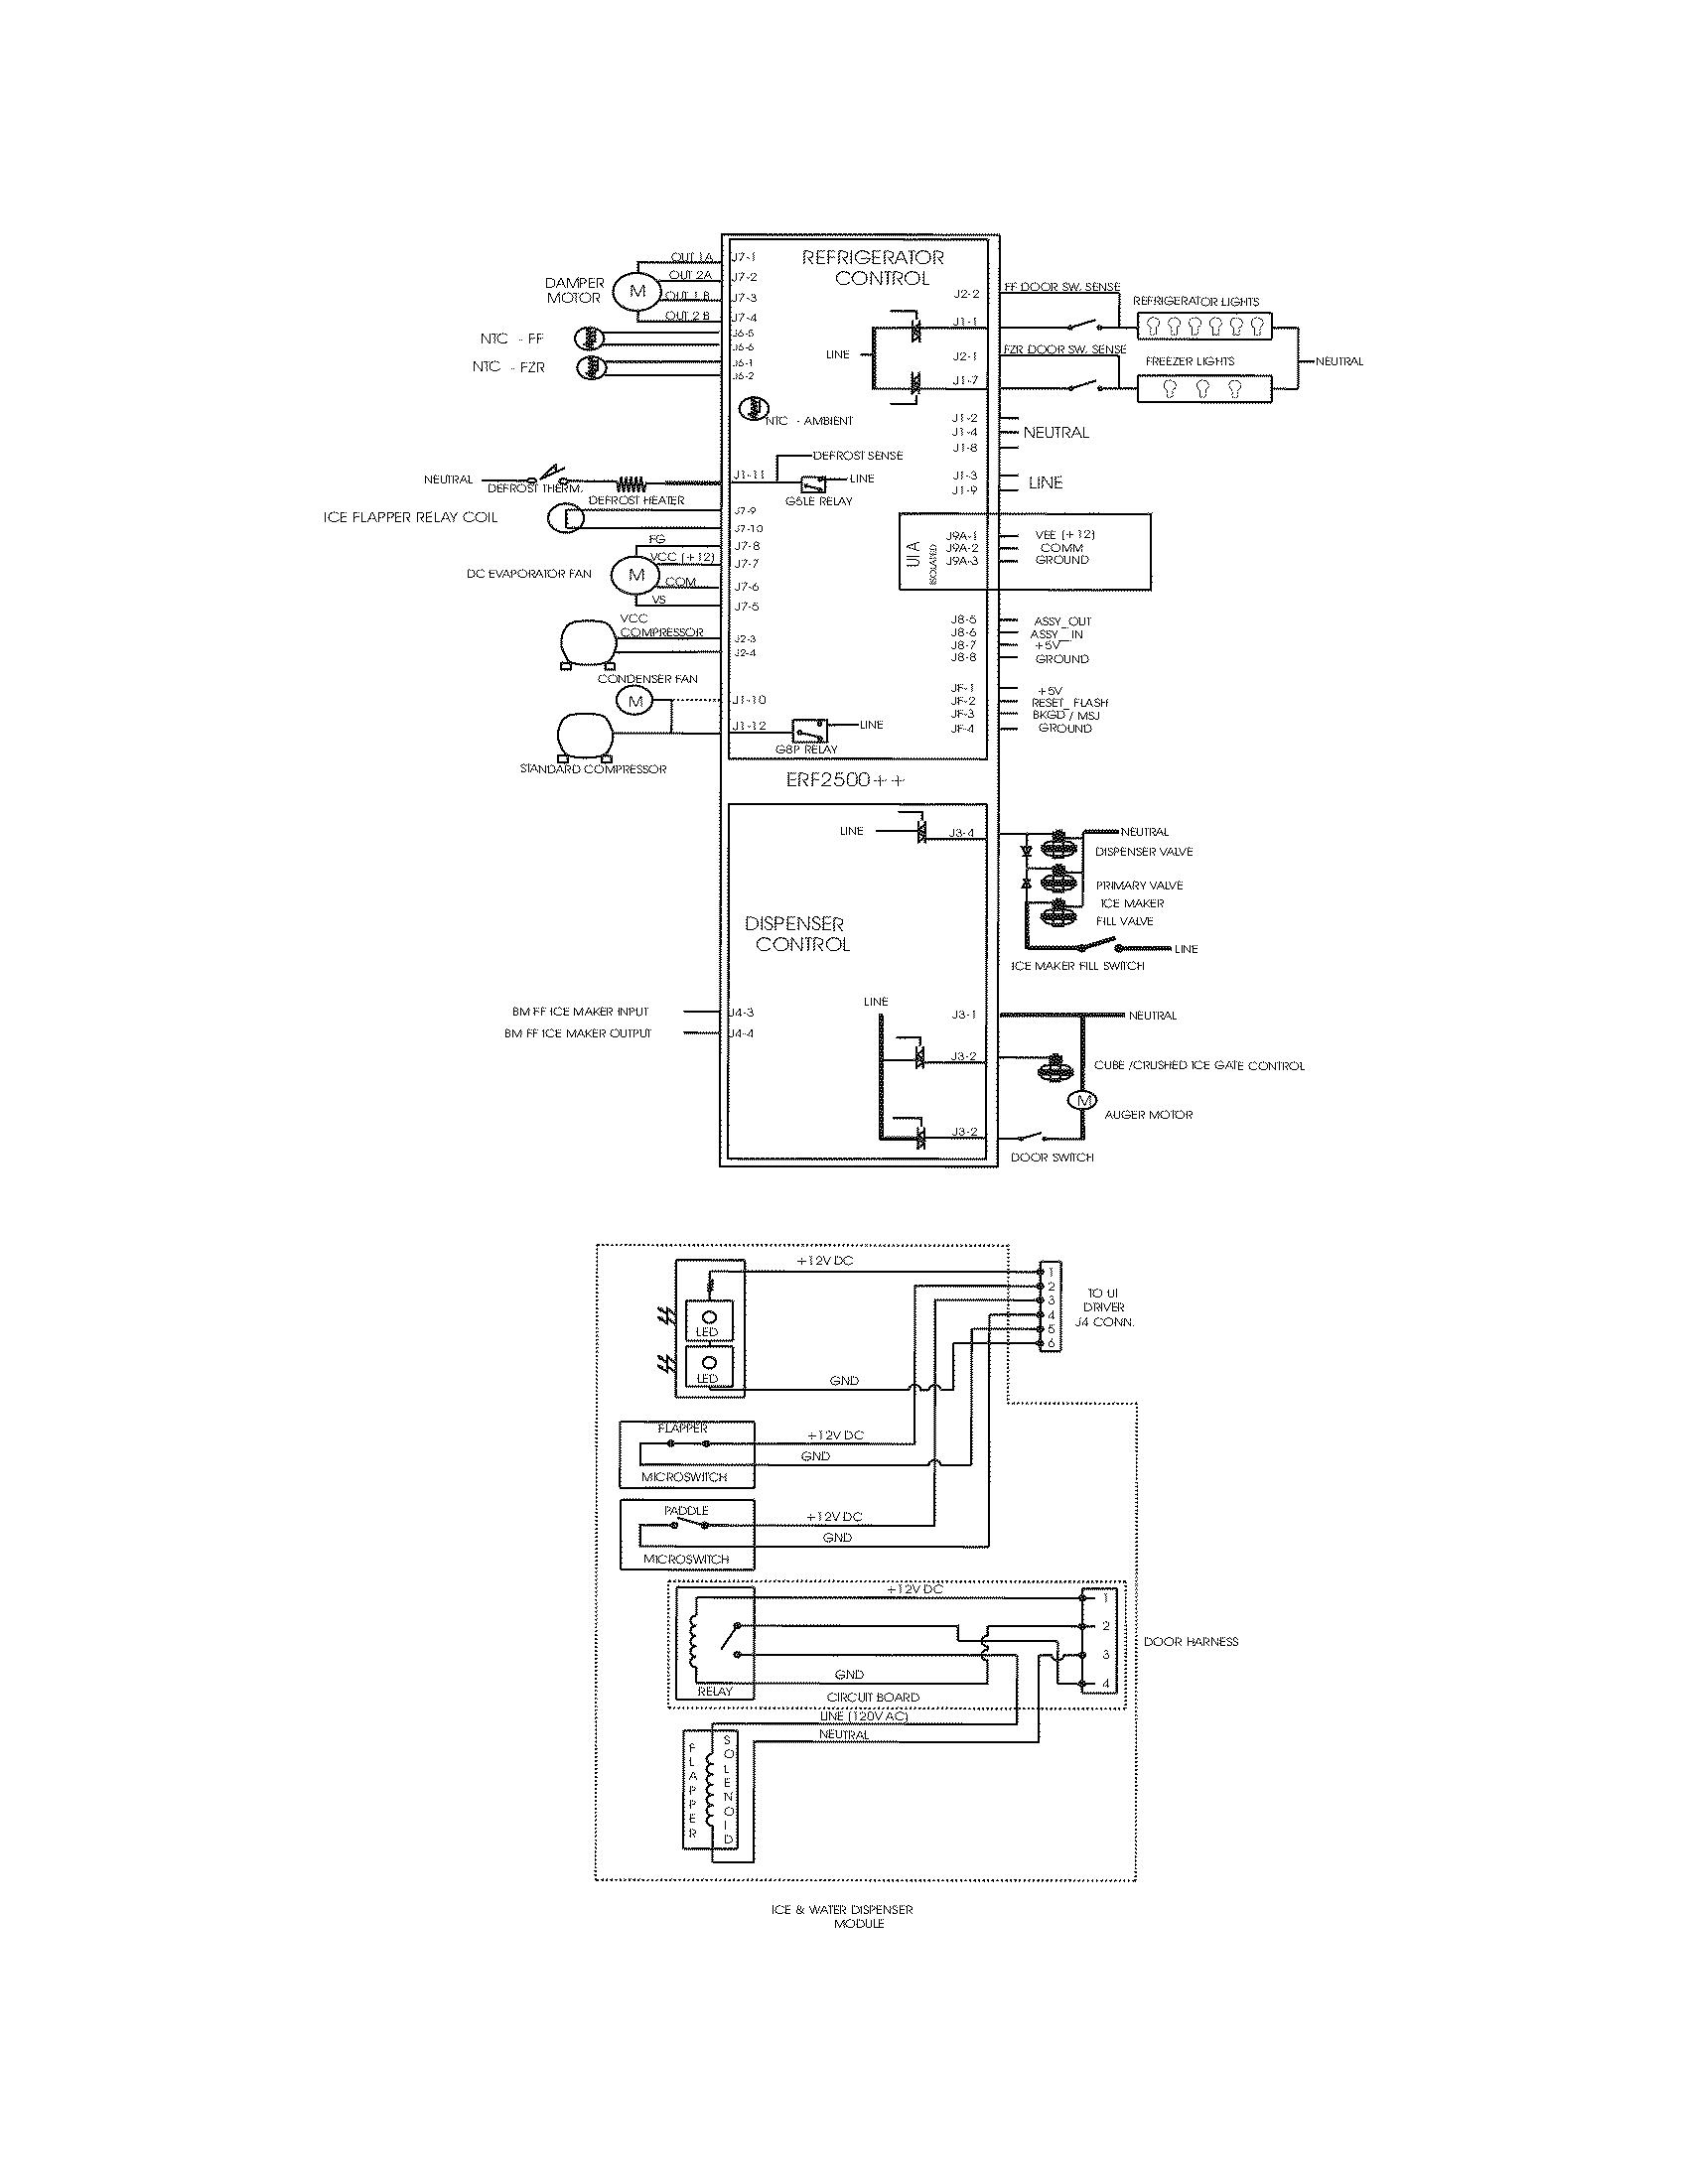 Frigidaire model LGHS2665KF0 side-by-side refrigerator